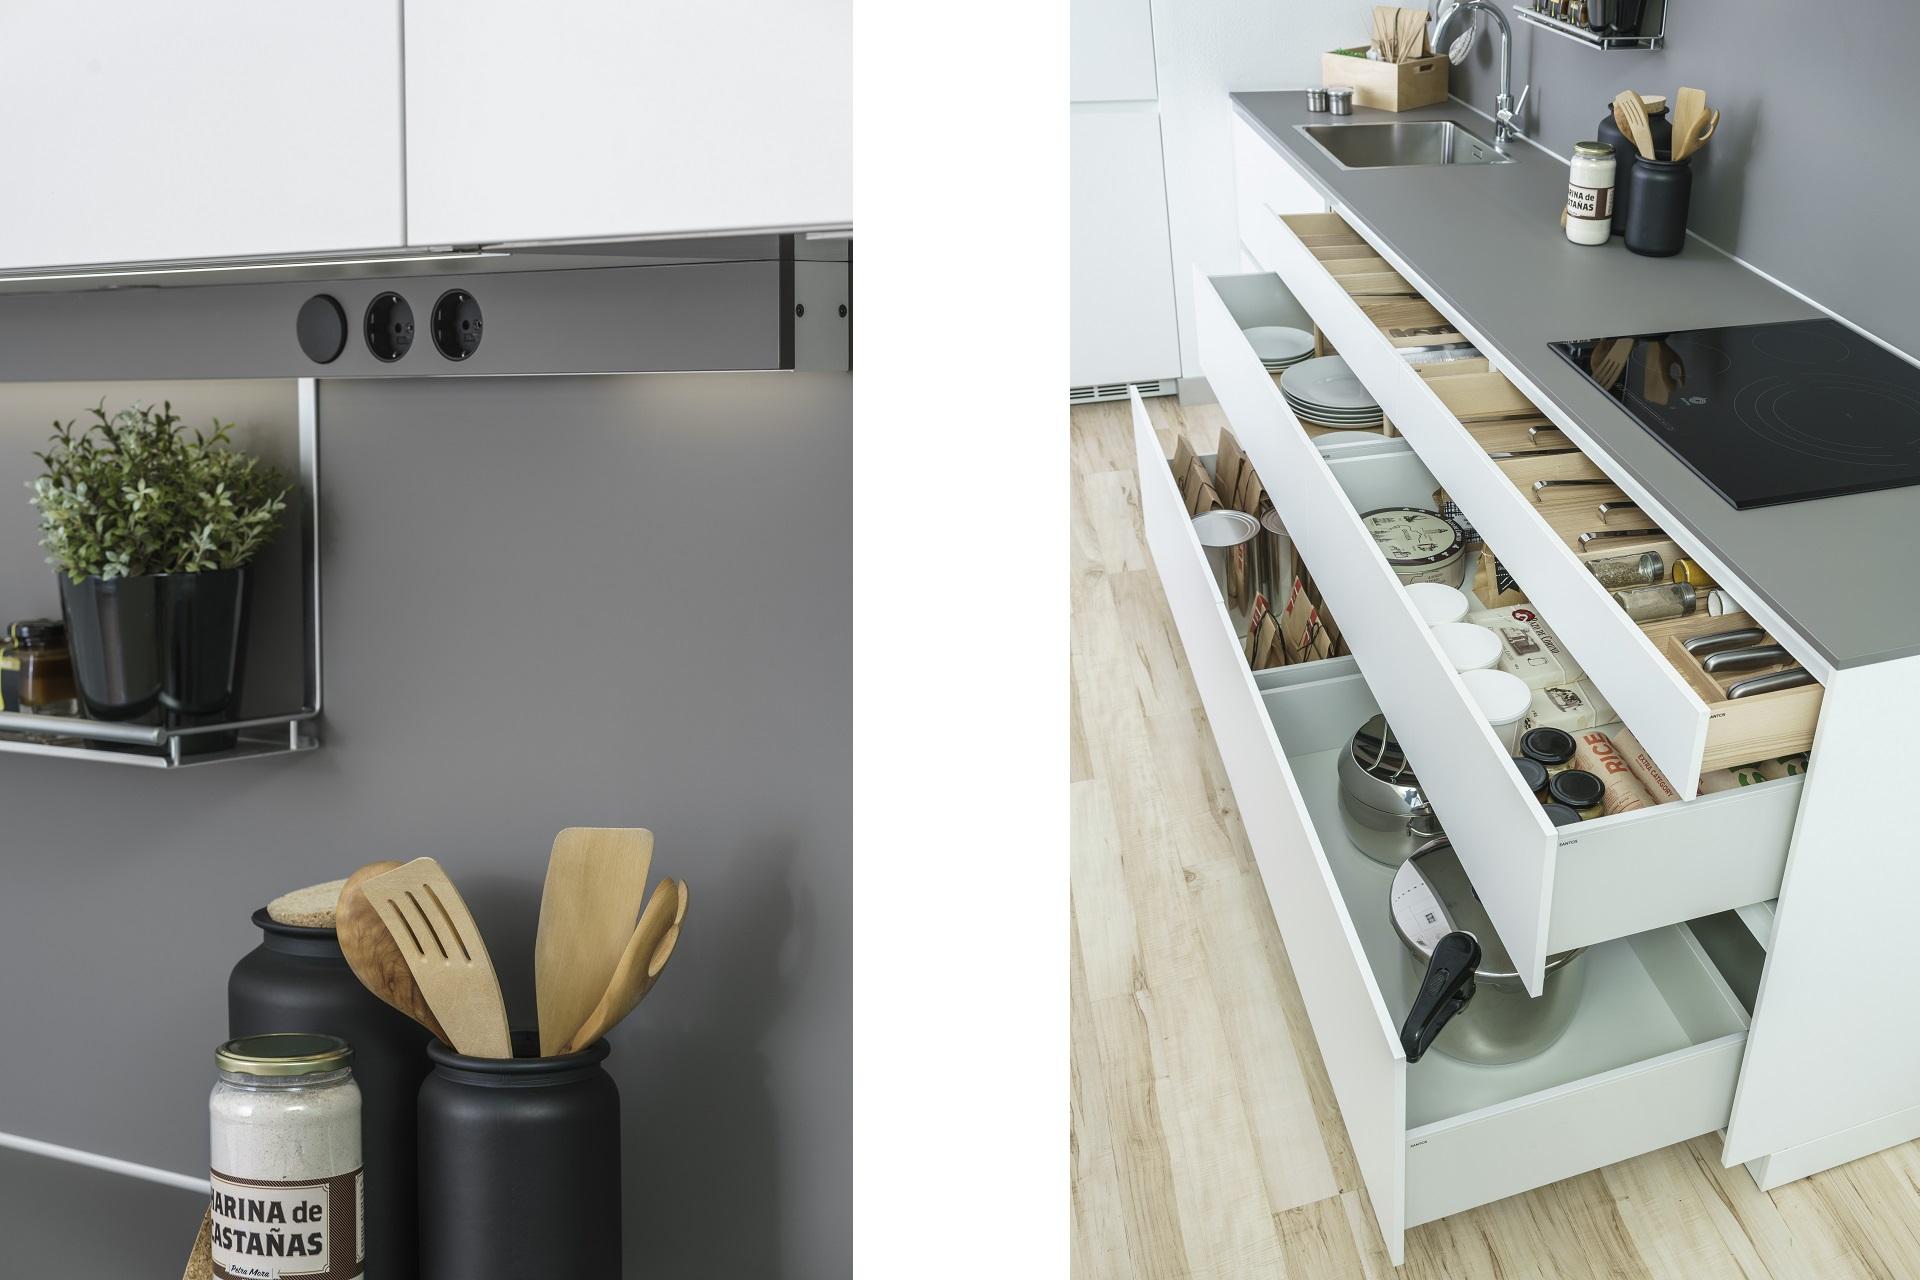 Image oferta-comprar-cocina-line-e-13